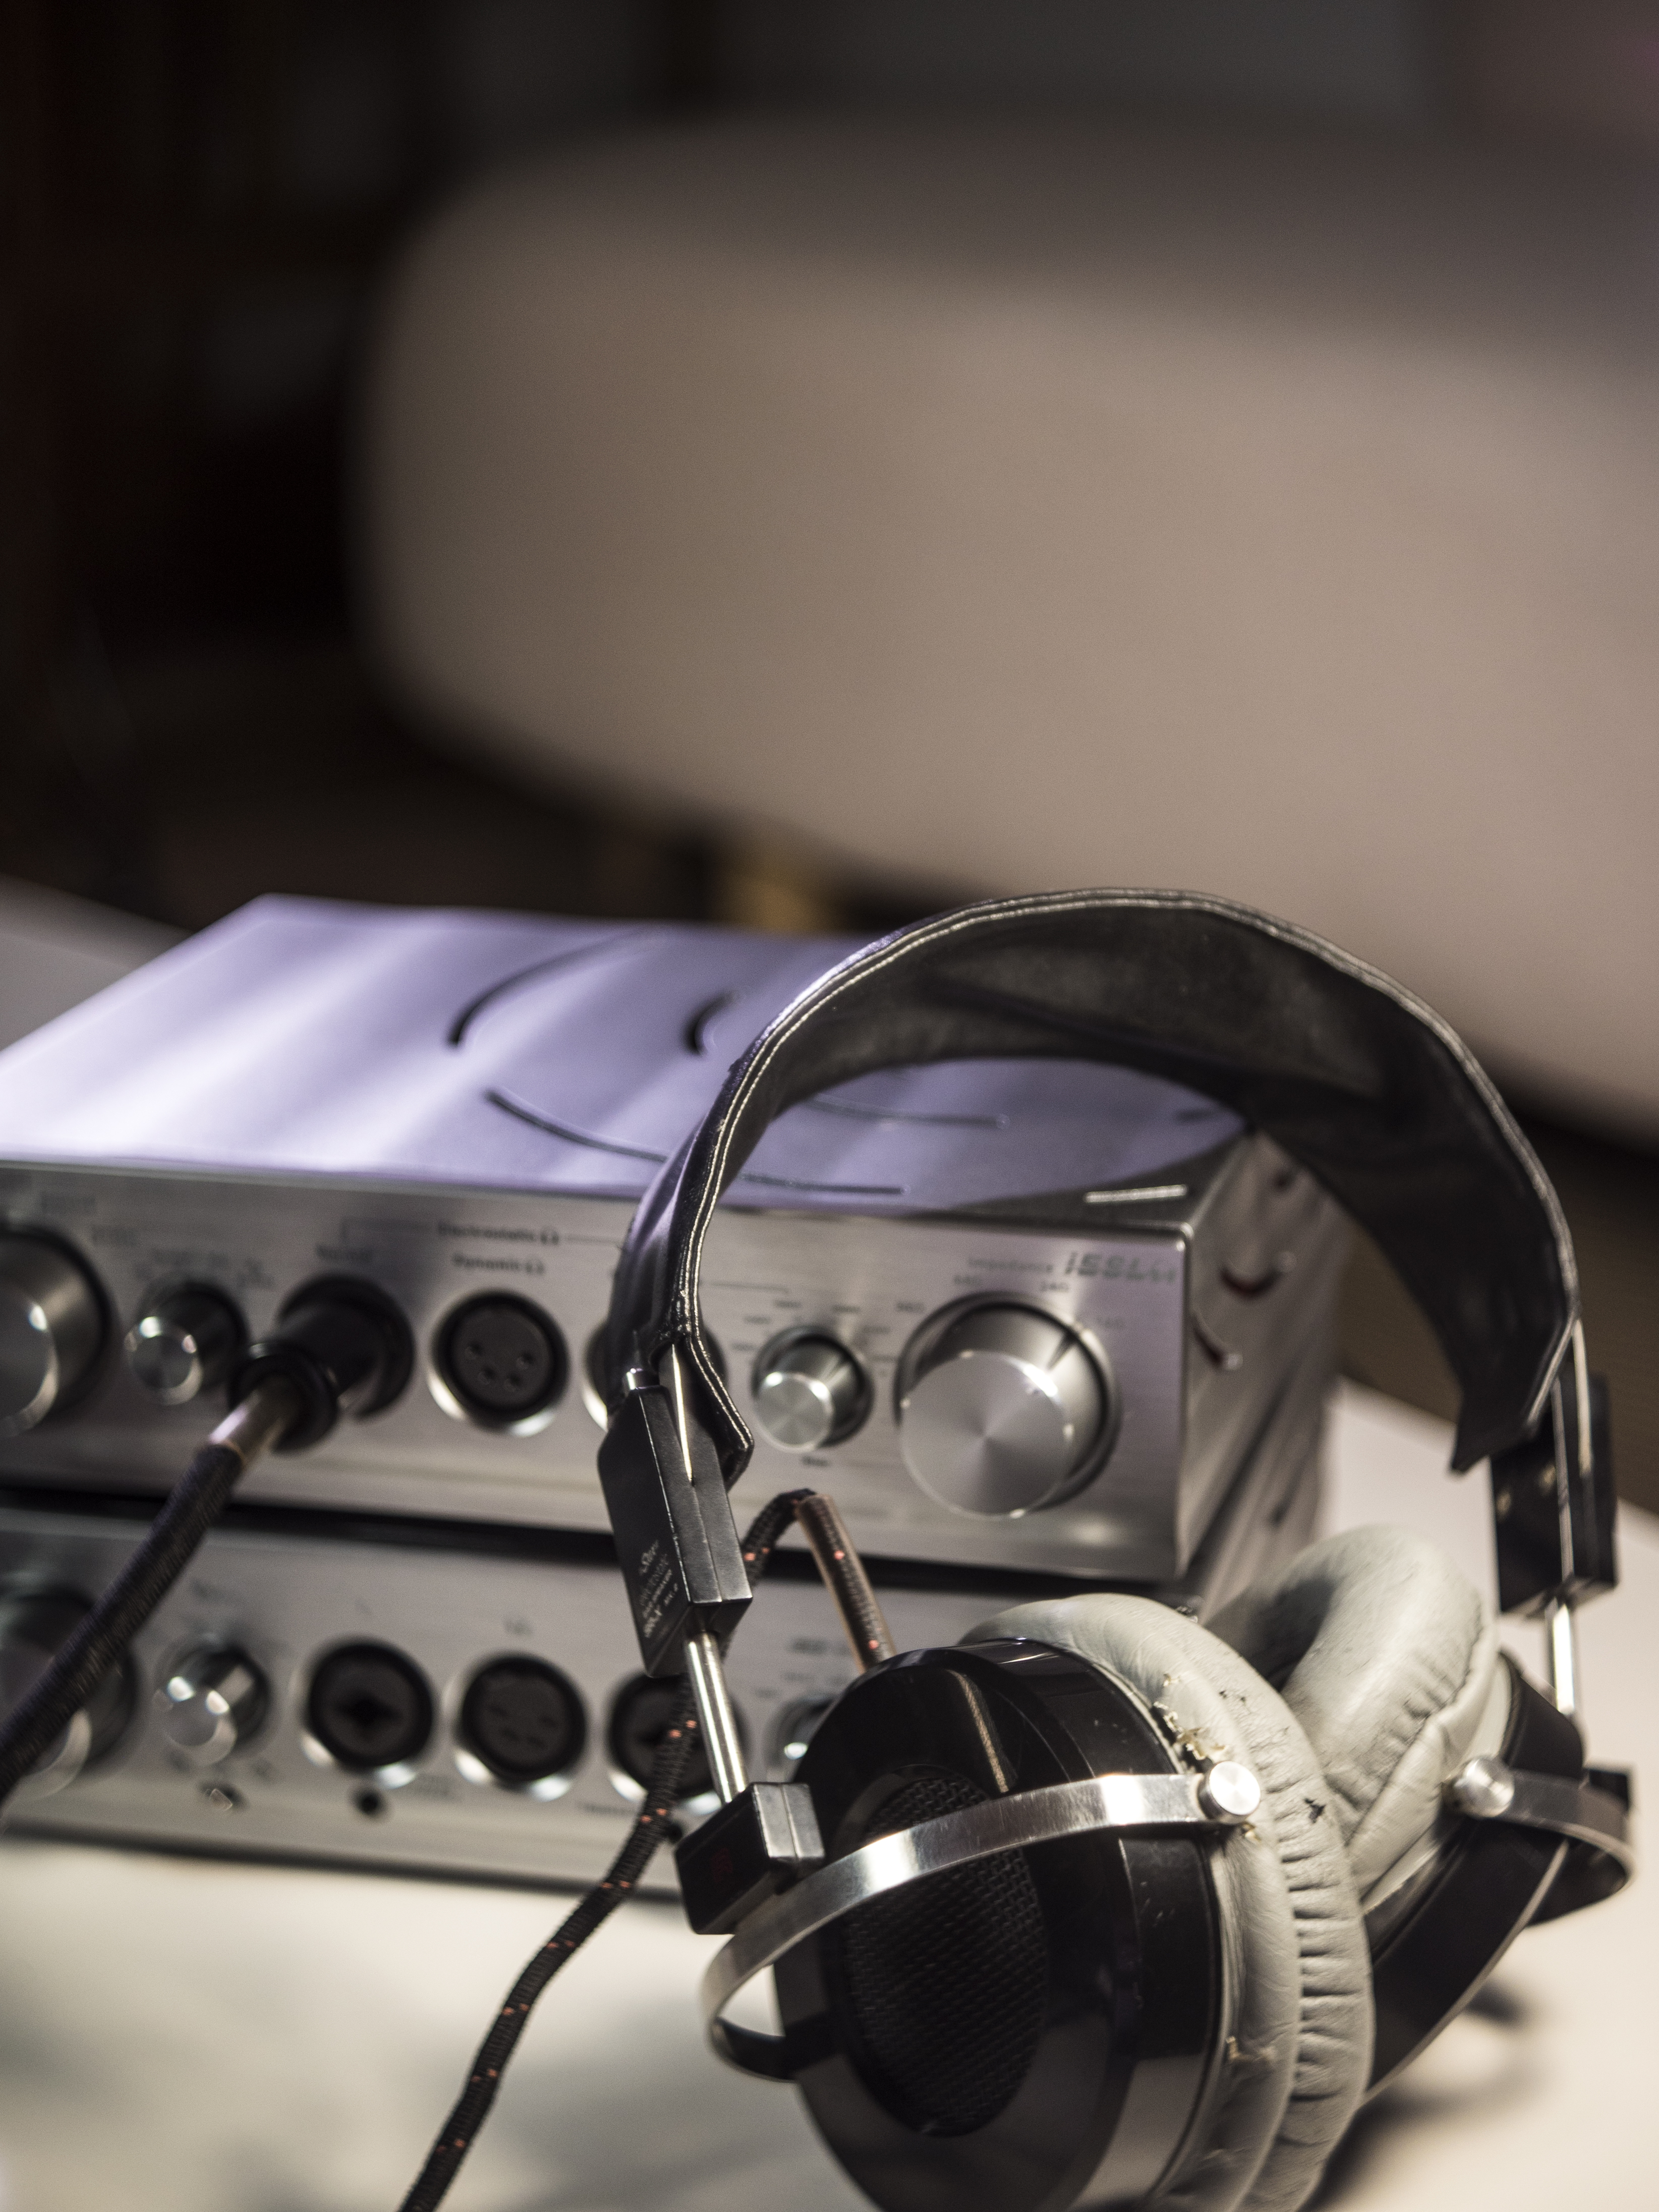 ifi audio pro iesl the official thread abbingdon music research ifi audio sponsored. Black Bedroom Furniture Sets. Home Design Ideas